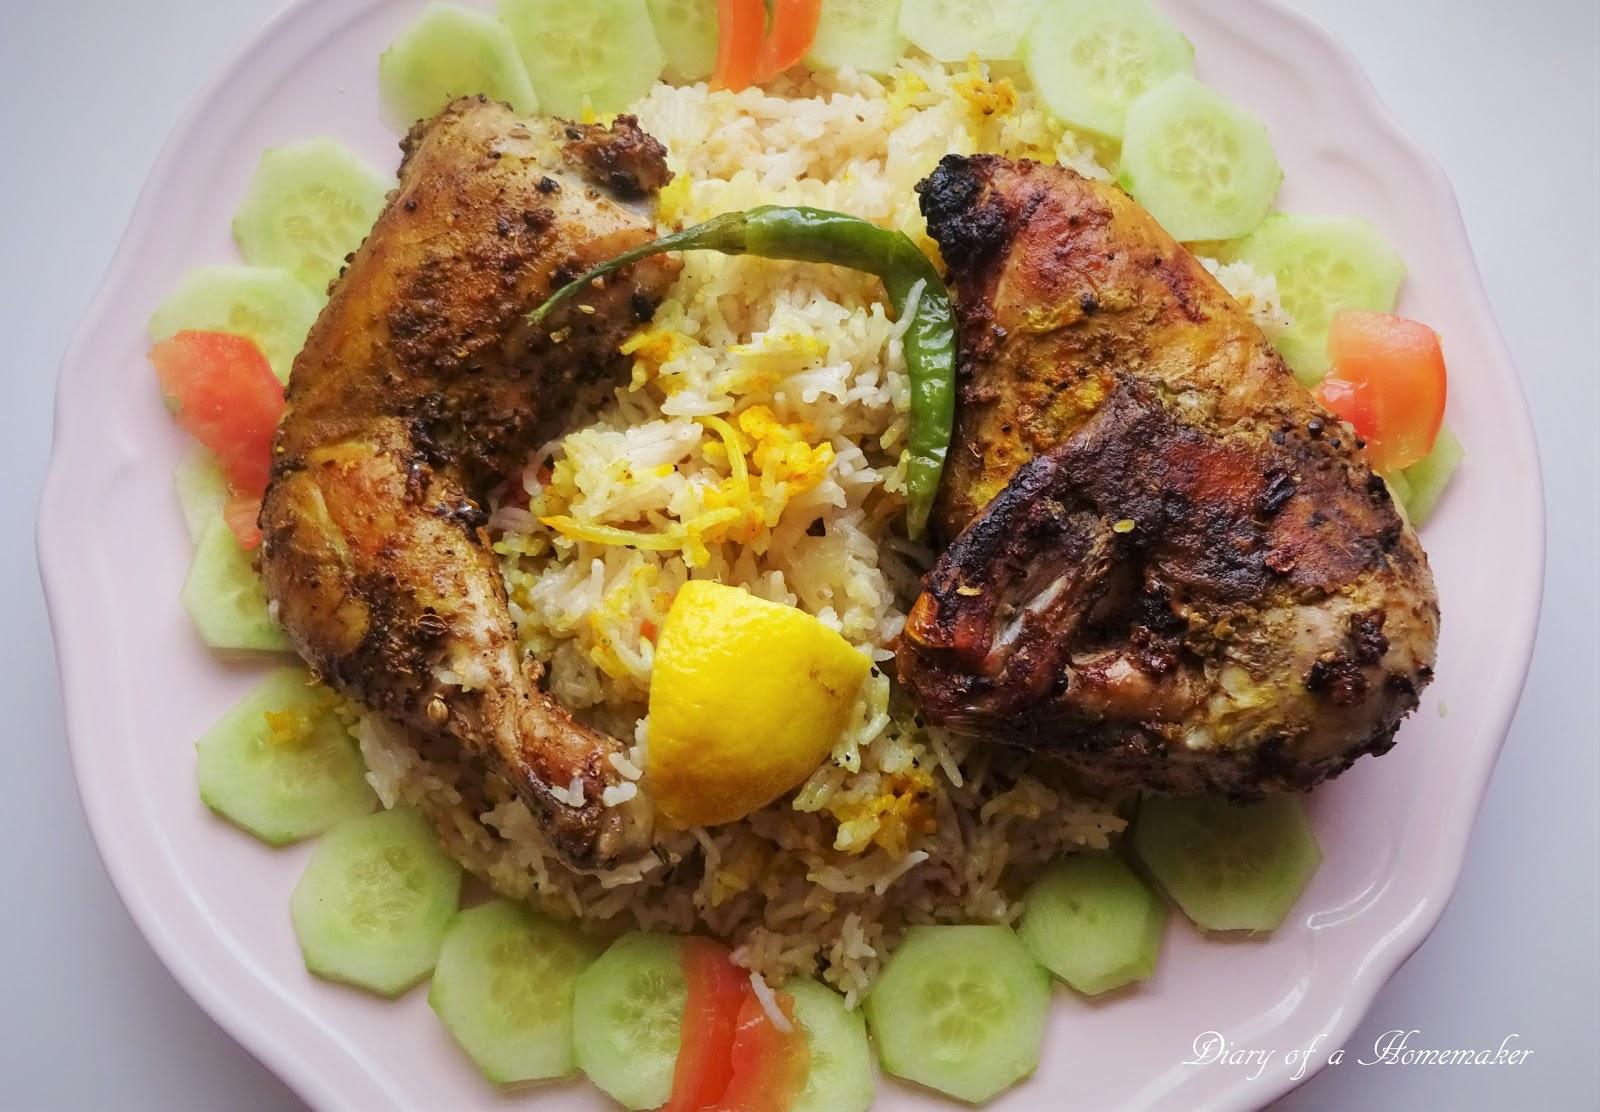 Diary of a homemaker delicious home cooked recipe collection yemeni mandi chicchickenken yemeni food arabic recipe rice lemon forumfinder Gallery